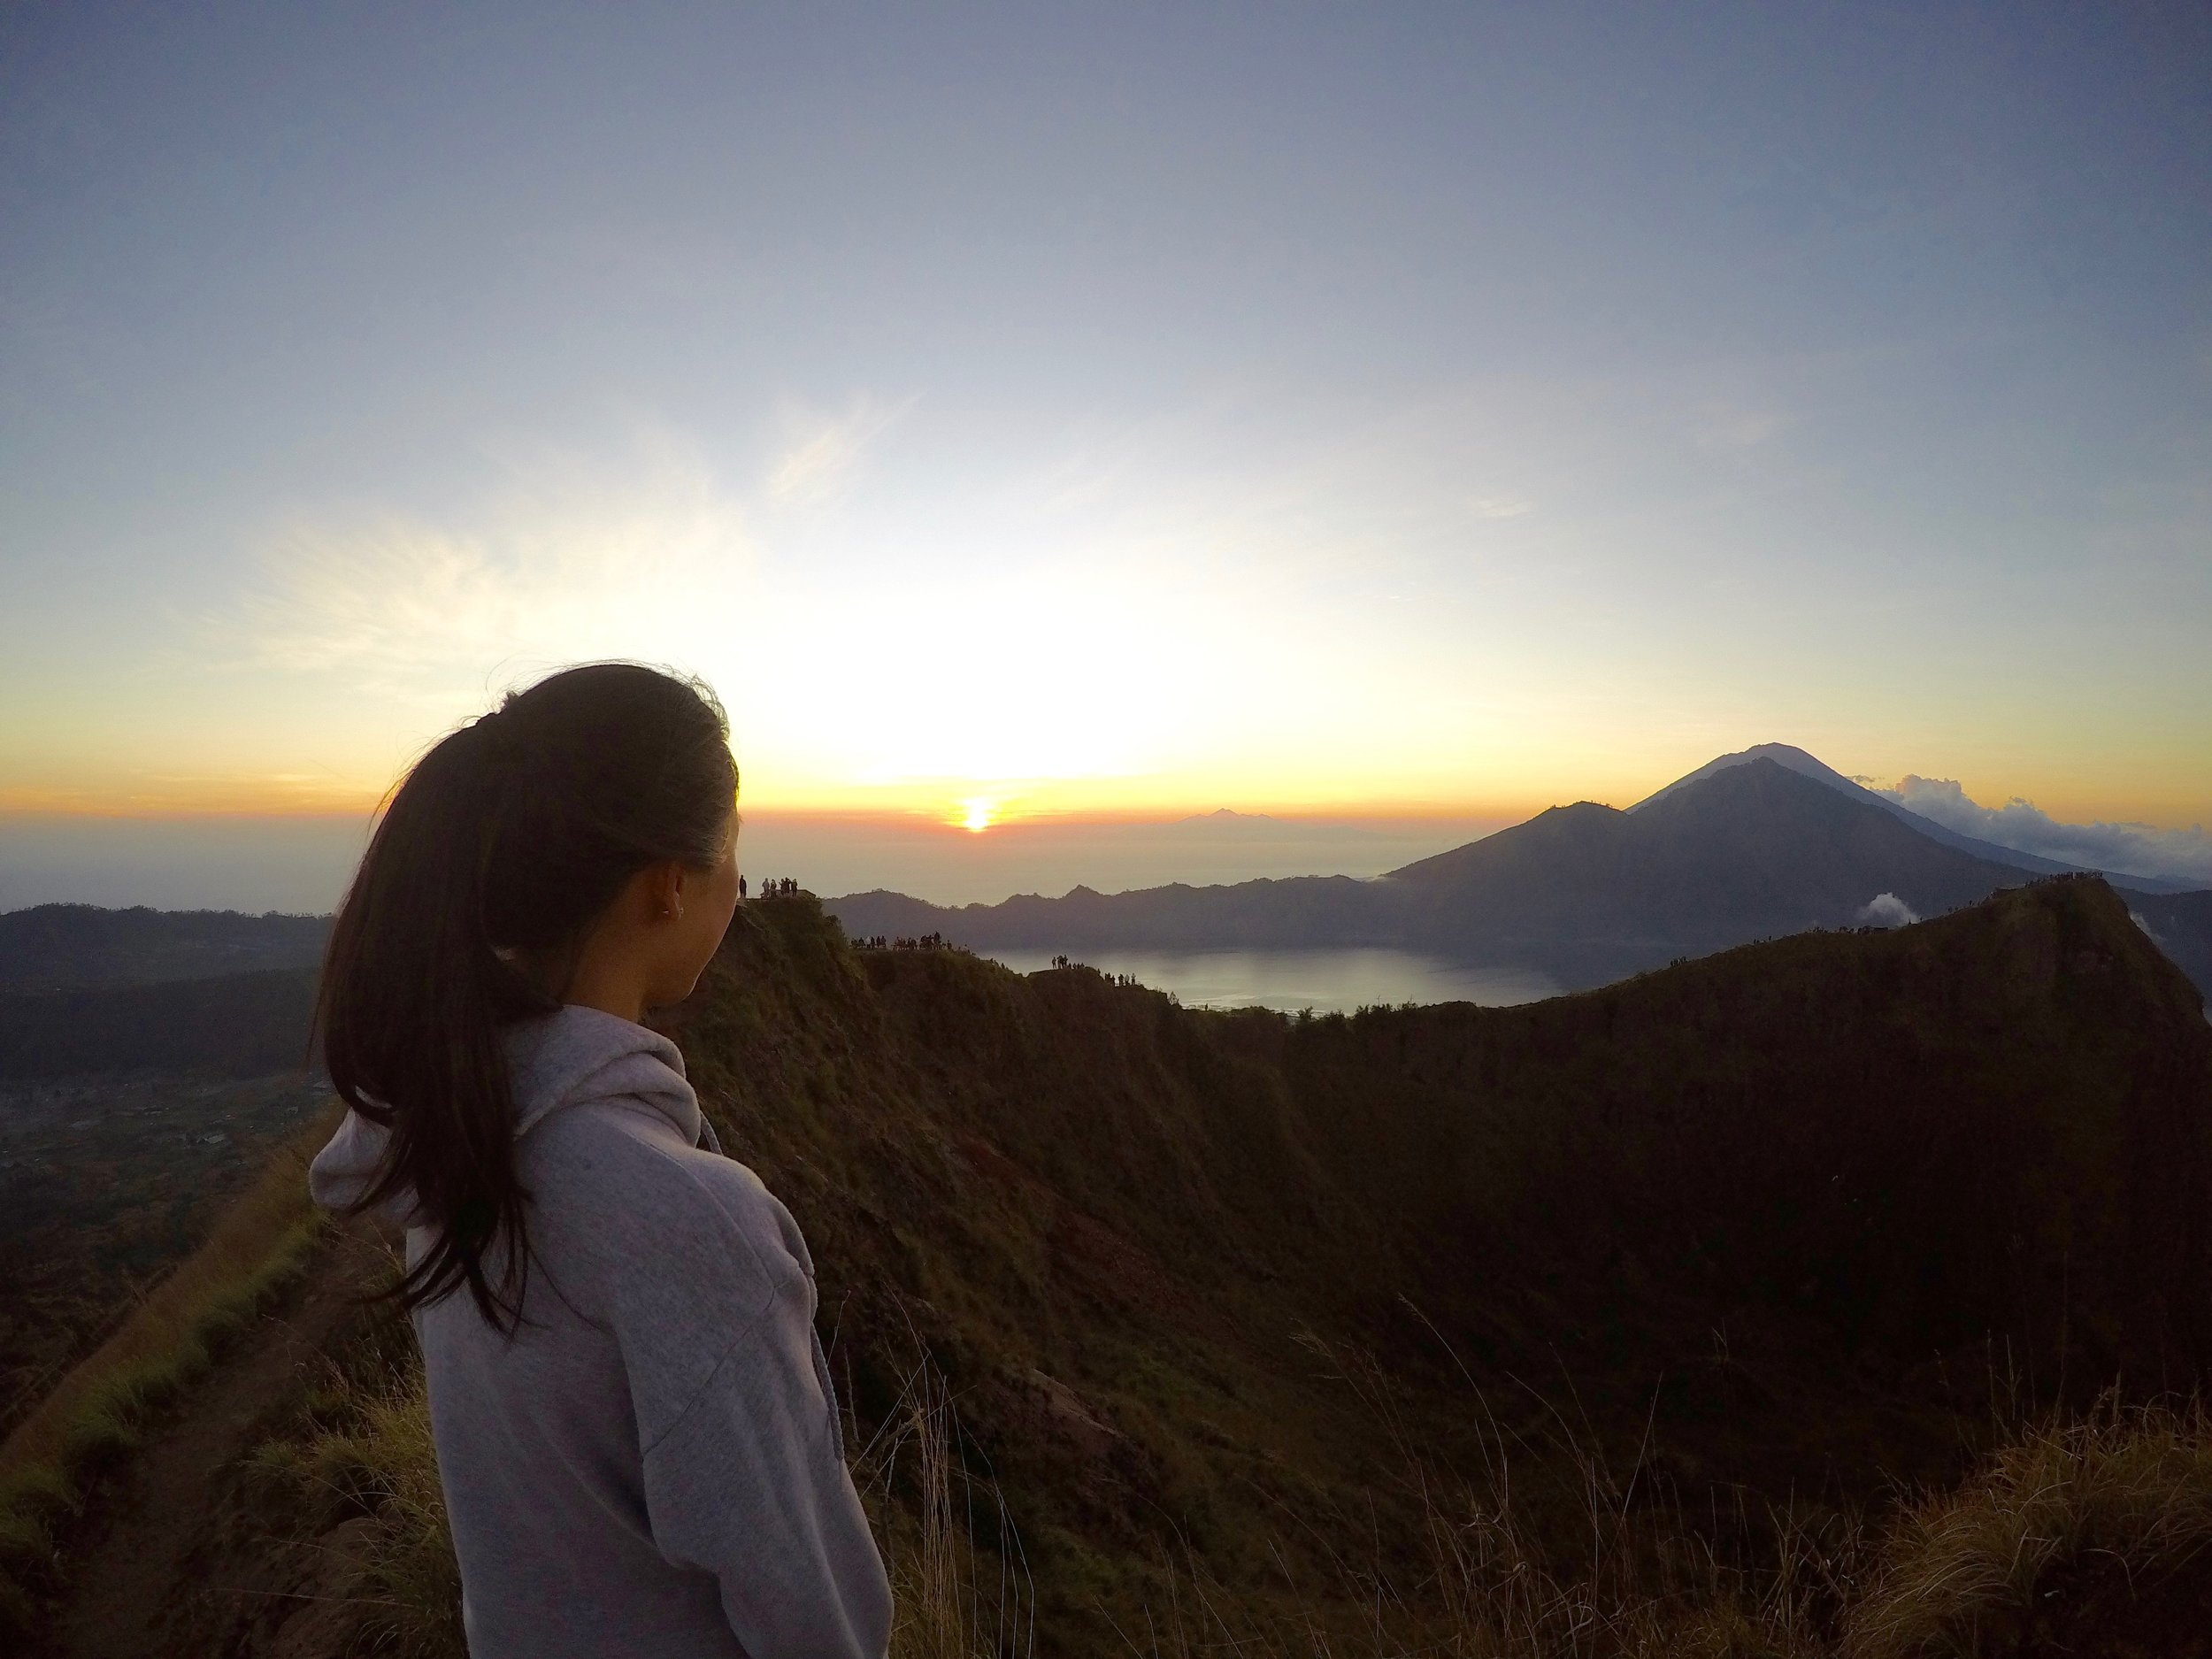 Mt Batur Sunrise Volcano Hike Bali Indonesia